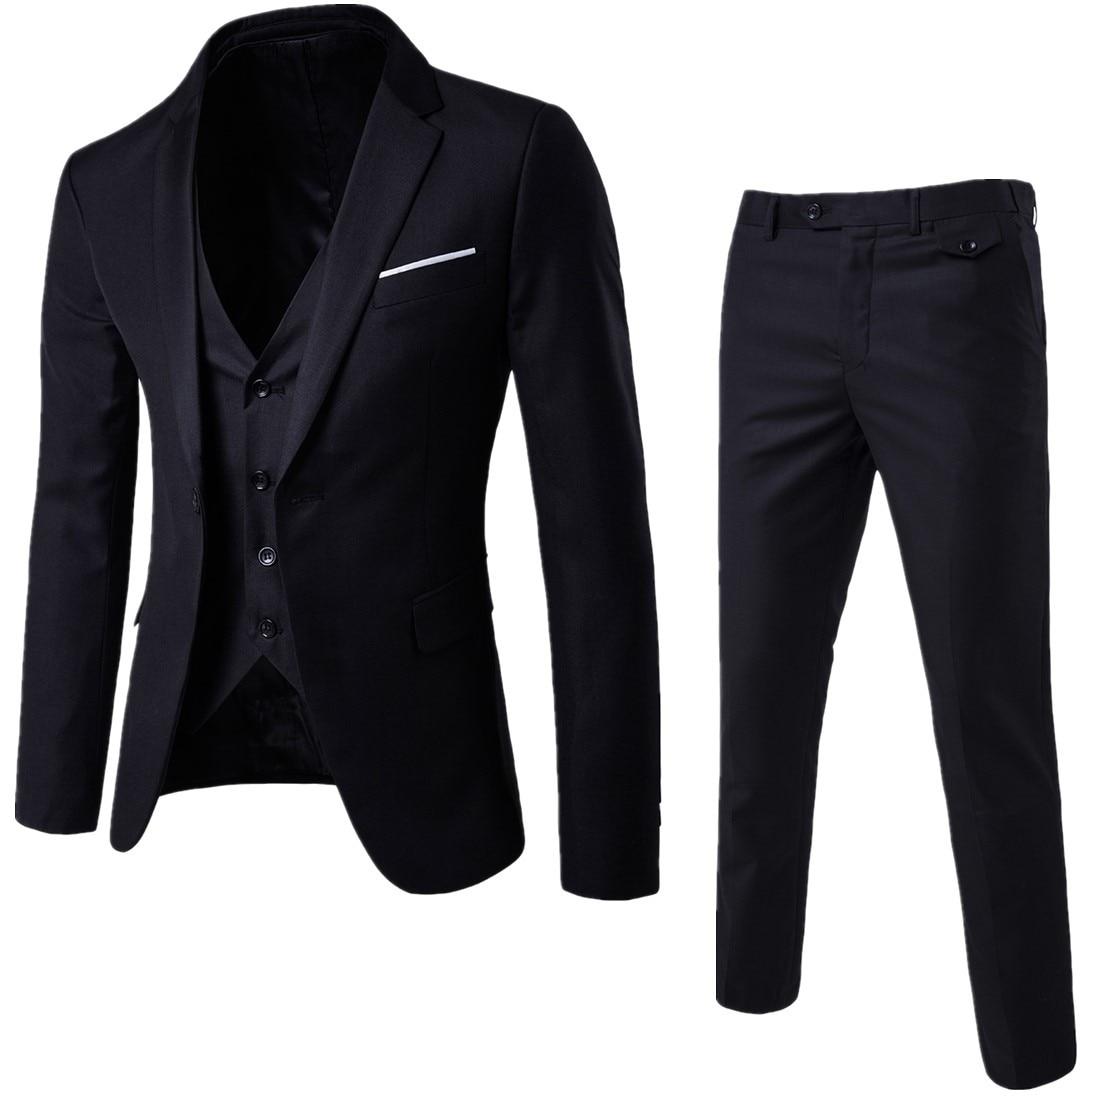 Autumn And Winter Suit Men Slim Fit Three-piece Set Groom Wedding Dress Marriage Best Man Suit Men's Wear Formal Wear